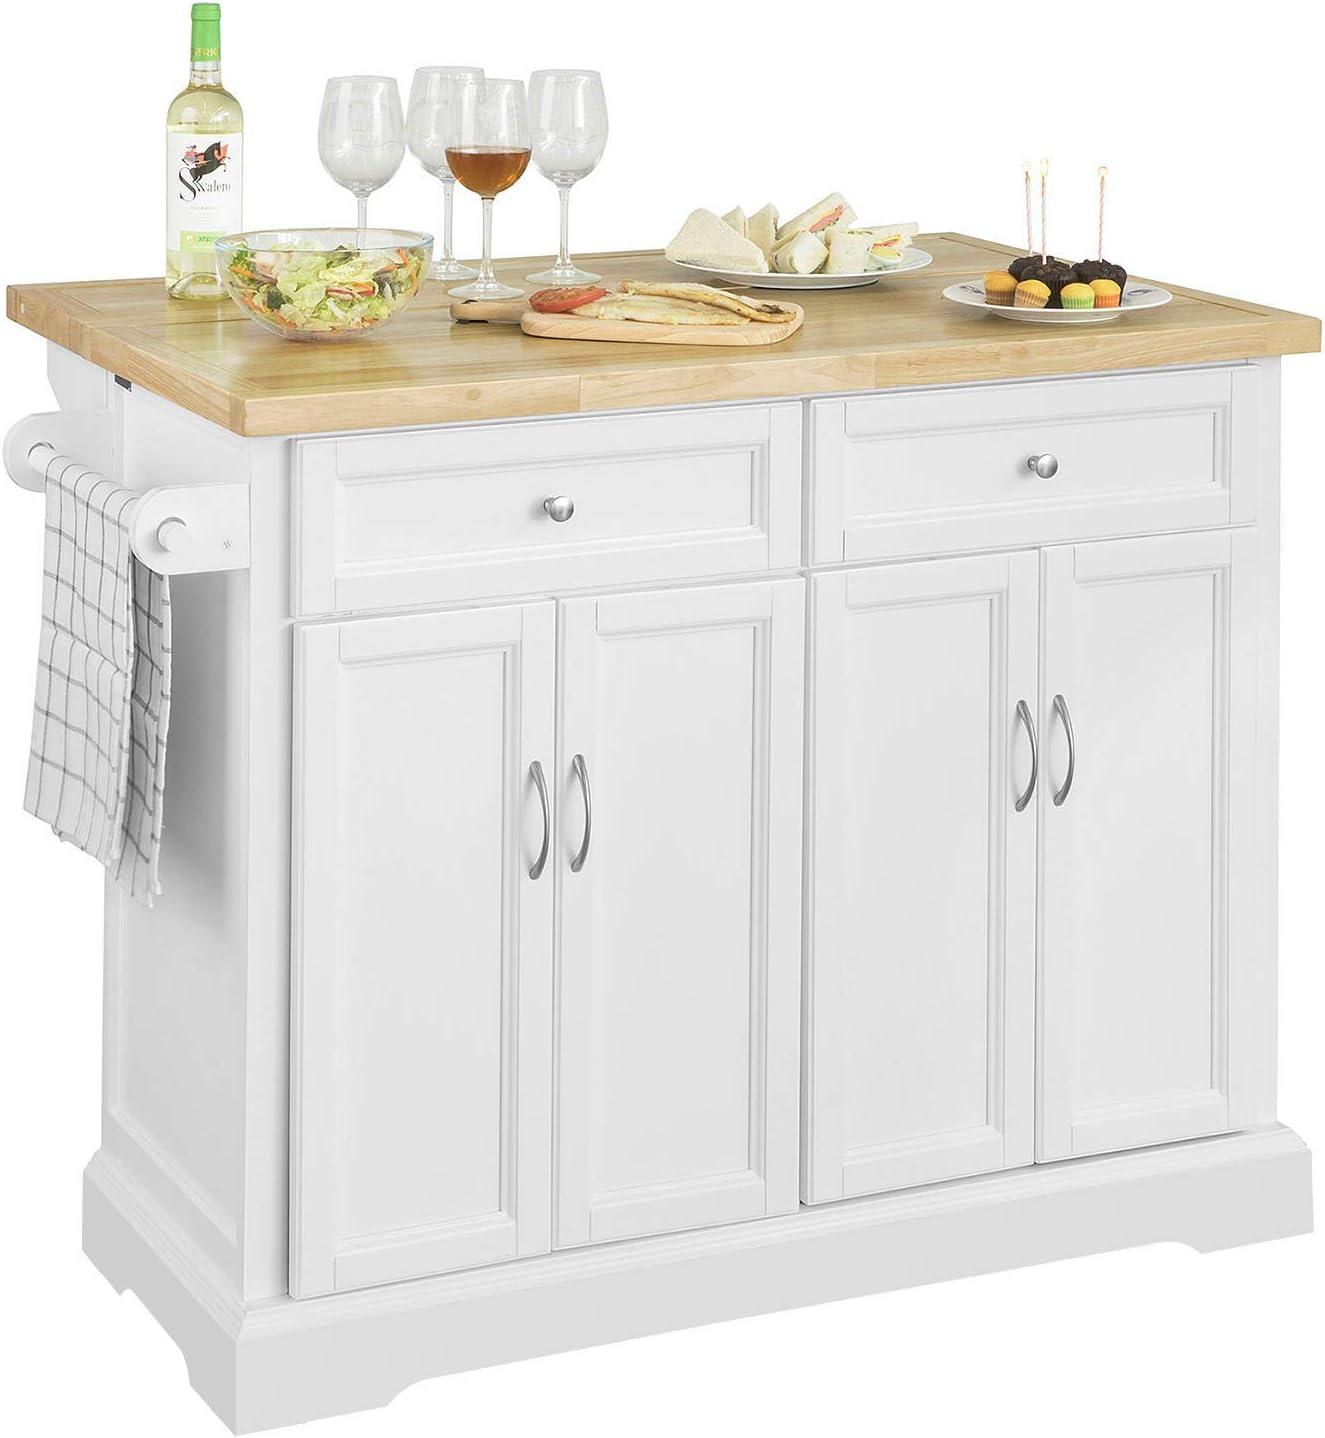 SoBuy FKW71-WN,Carrito de Cocina con Piso,con Tablero Extensible,L115 x P46 x H92cm,ES (Blanco)